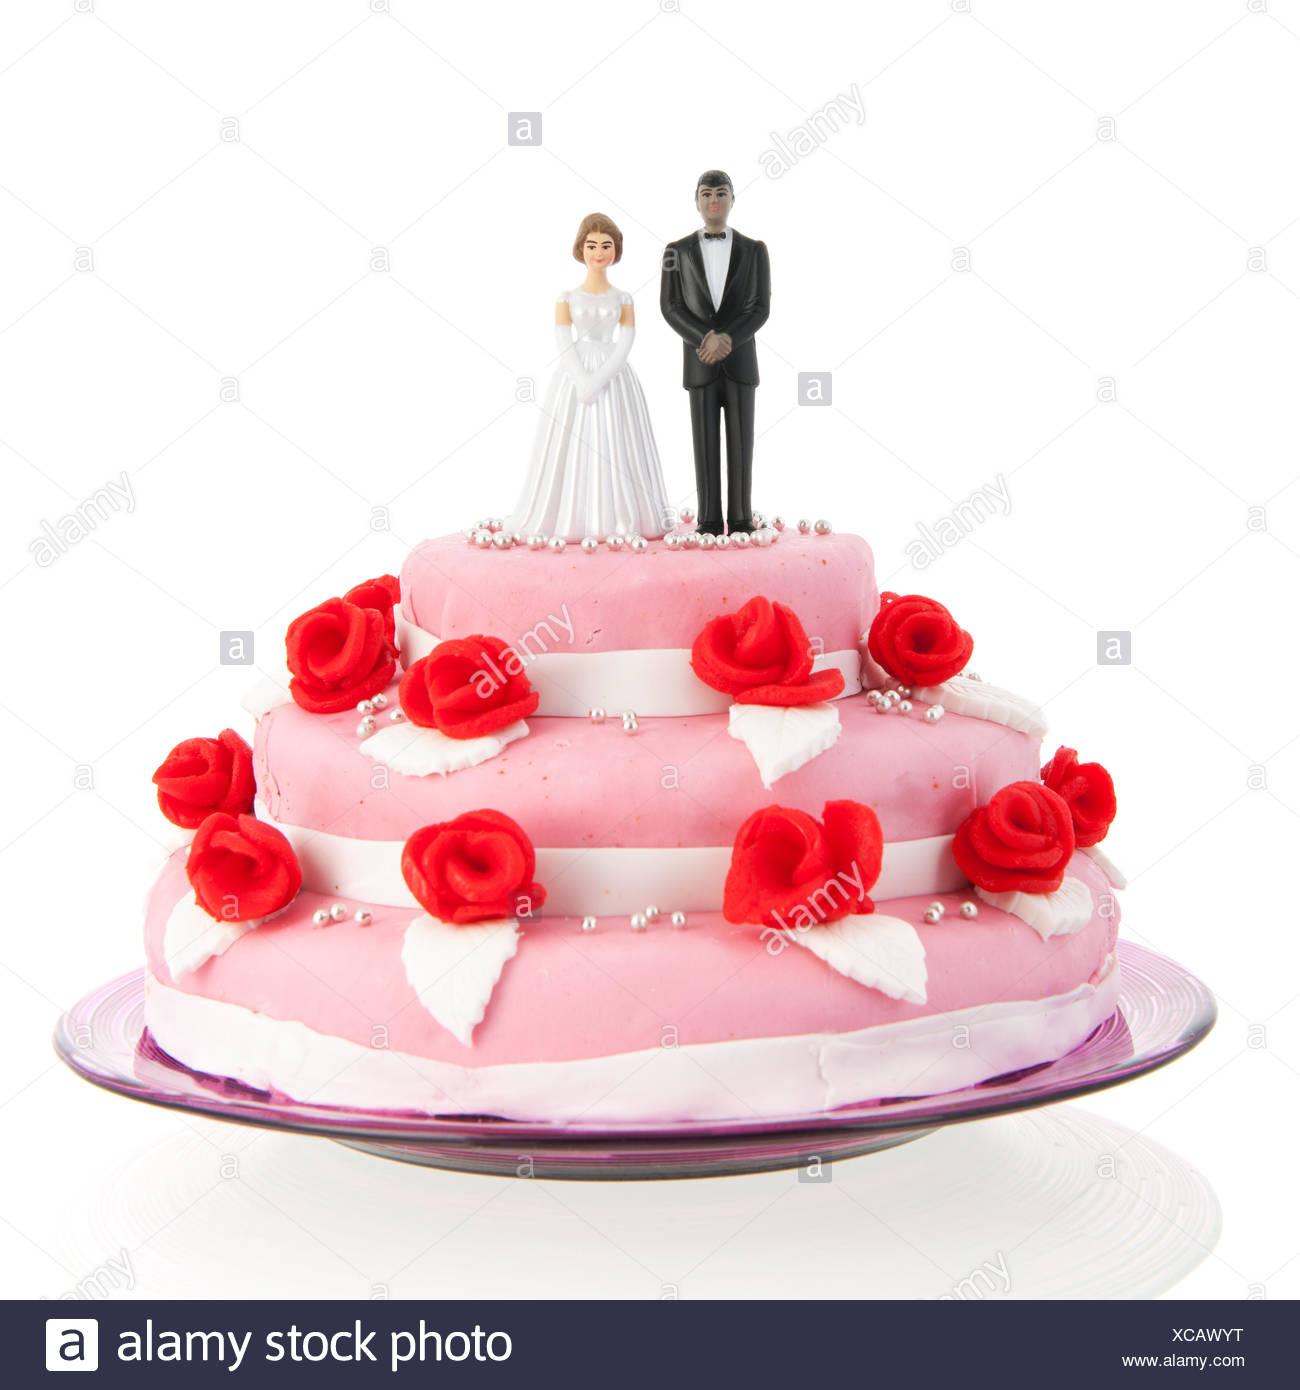 Wedding Cake Marzipan Bride Groom Stock Photos & Wedding Cake ...